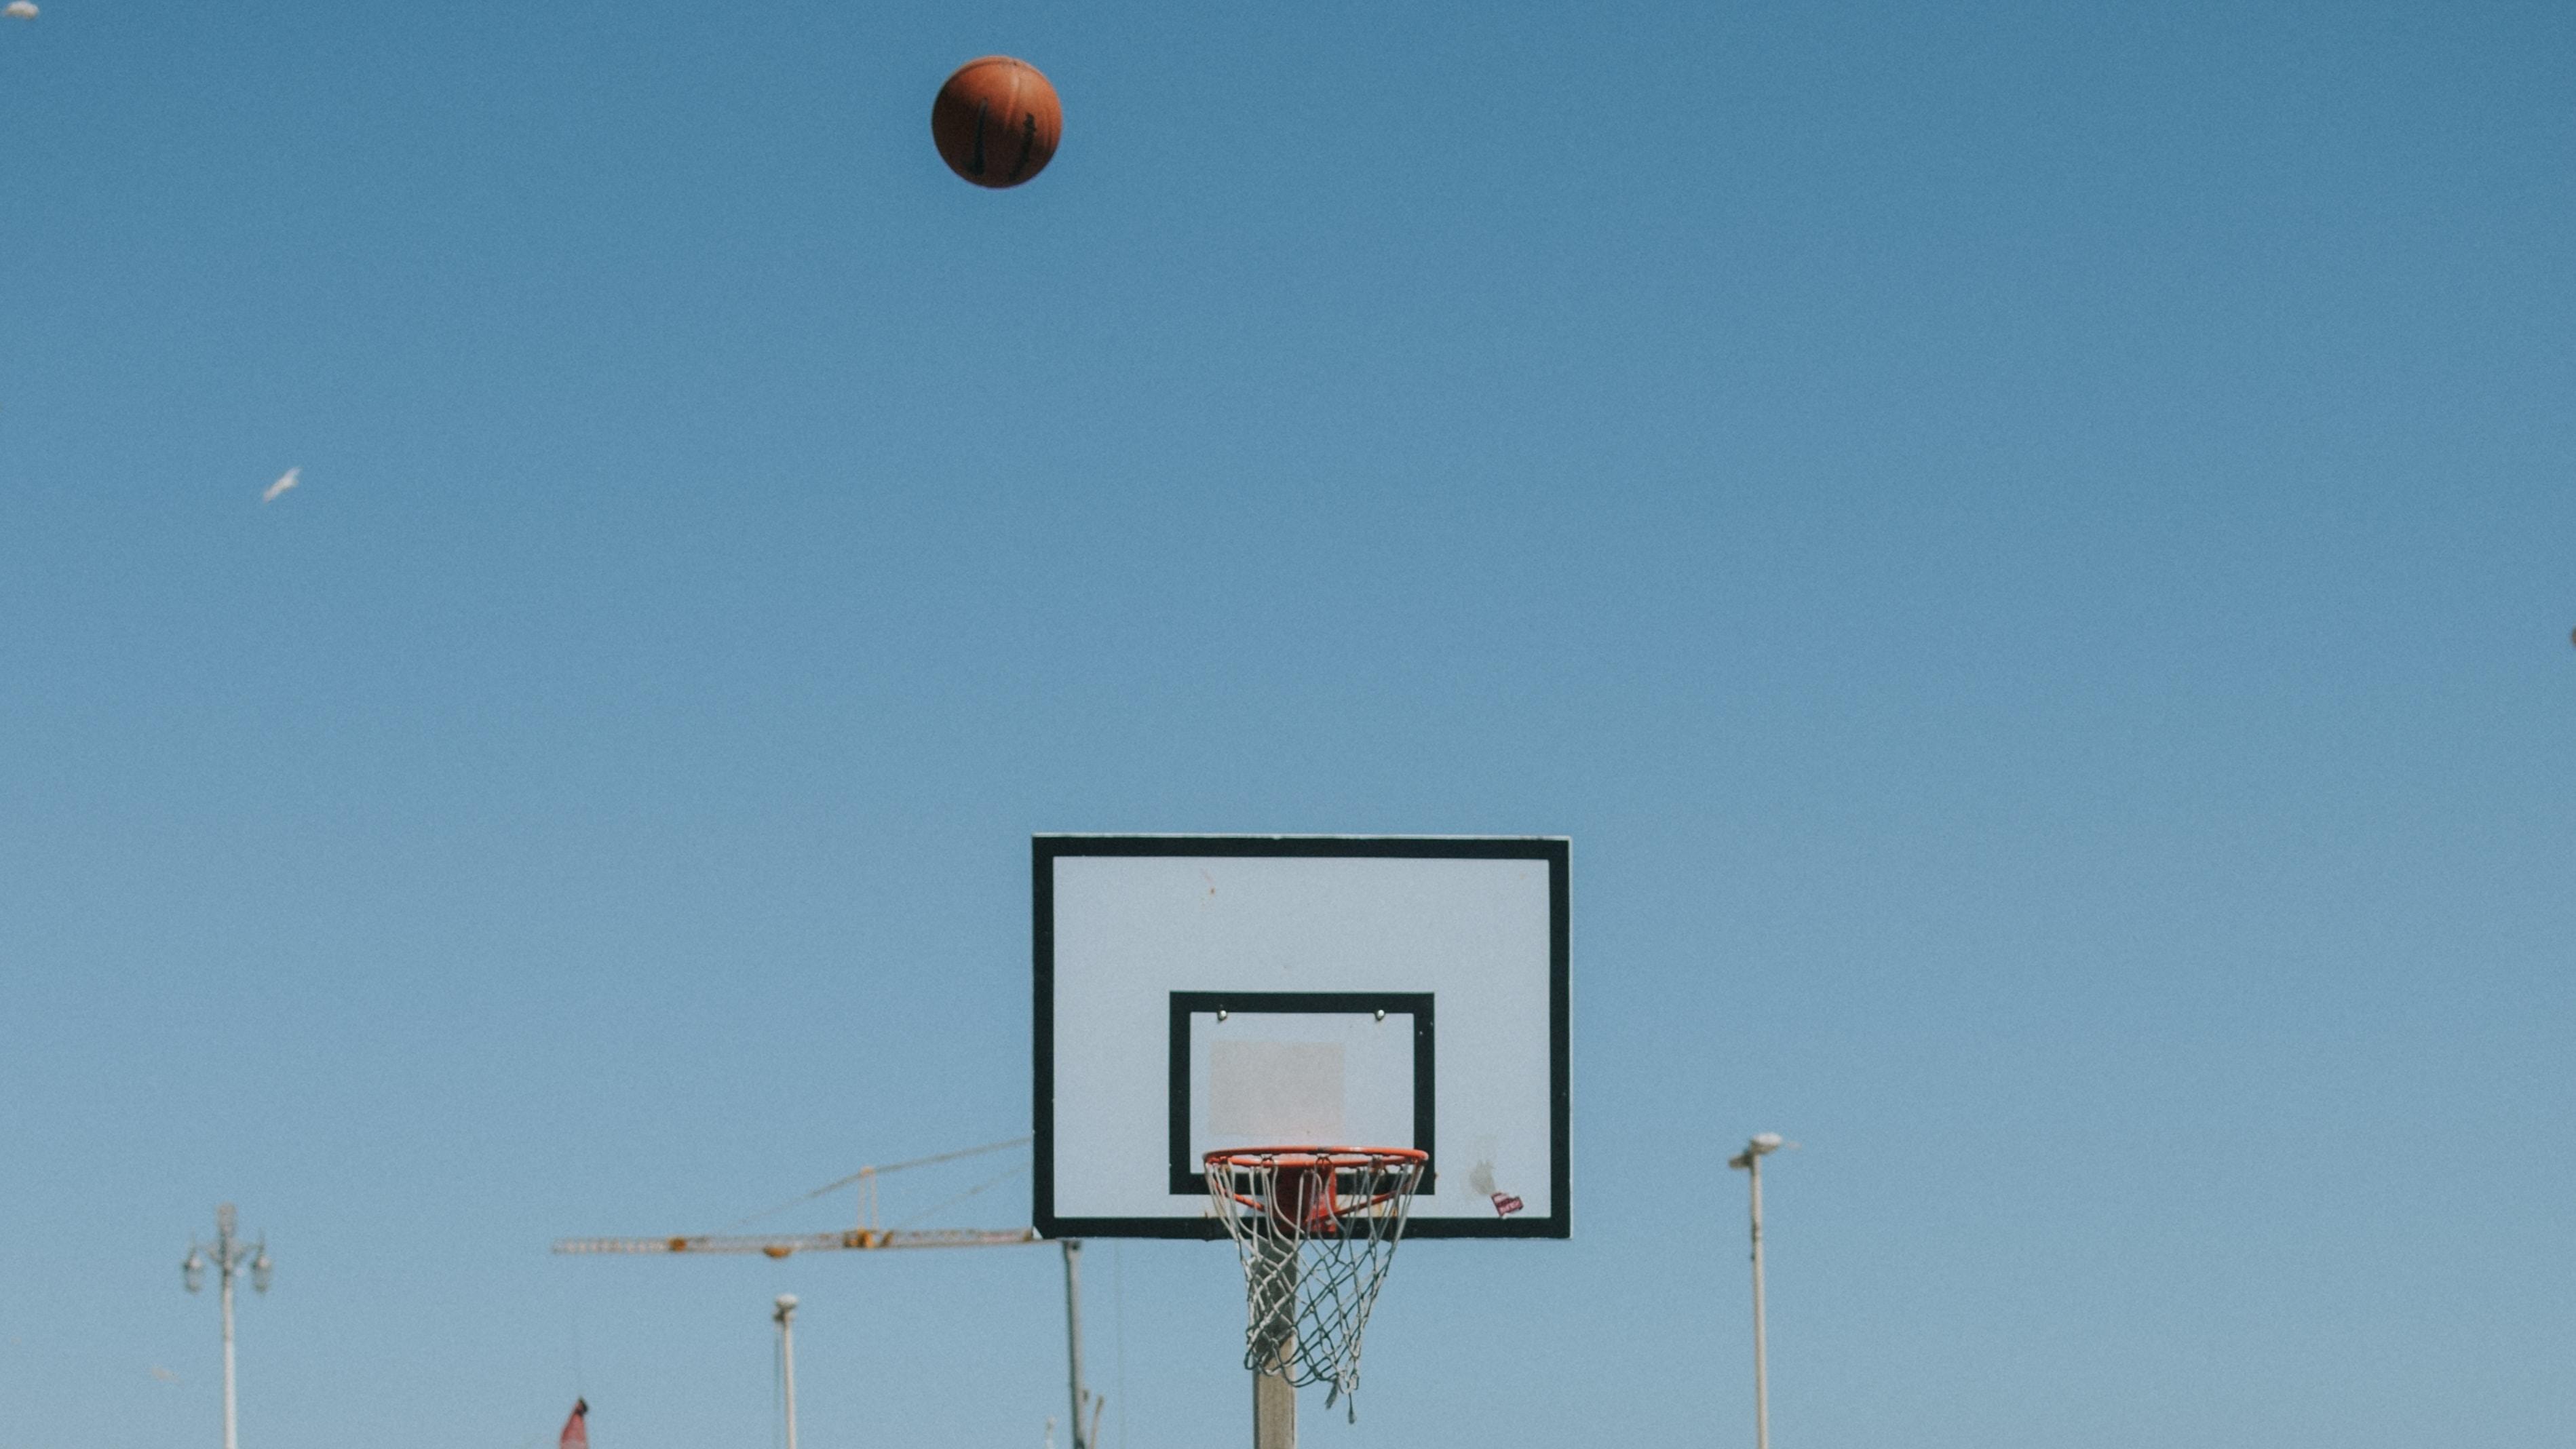 flying basketball and basketball hoop under blue sky during daytime